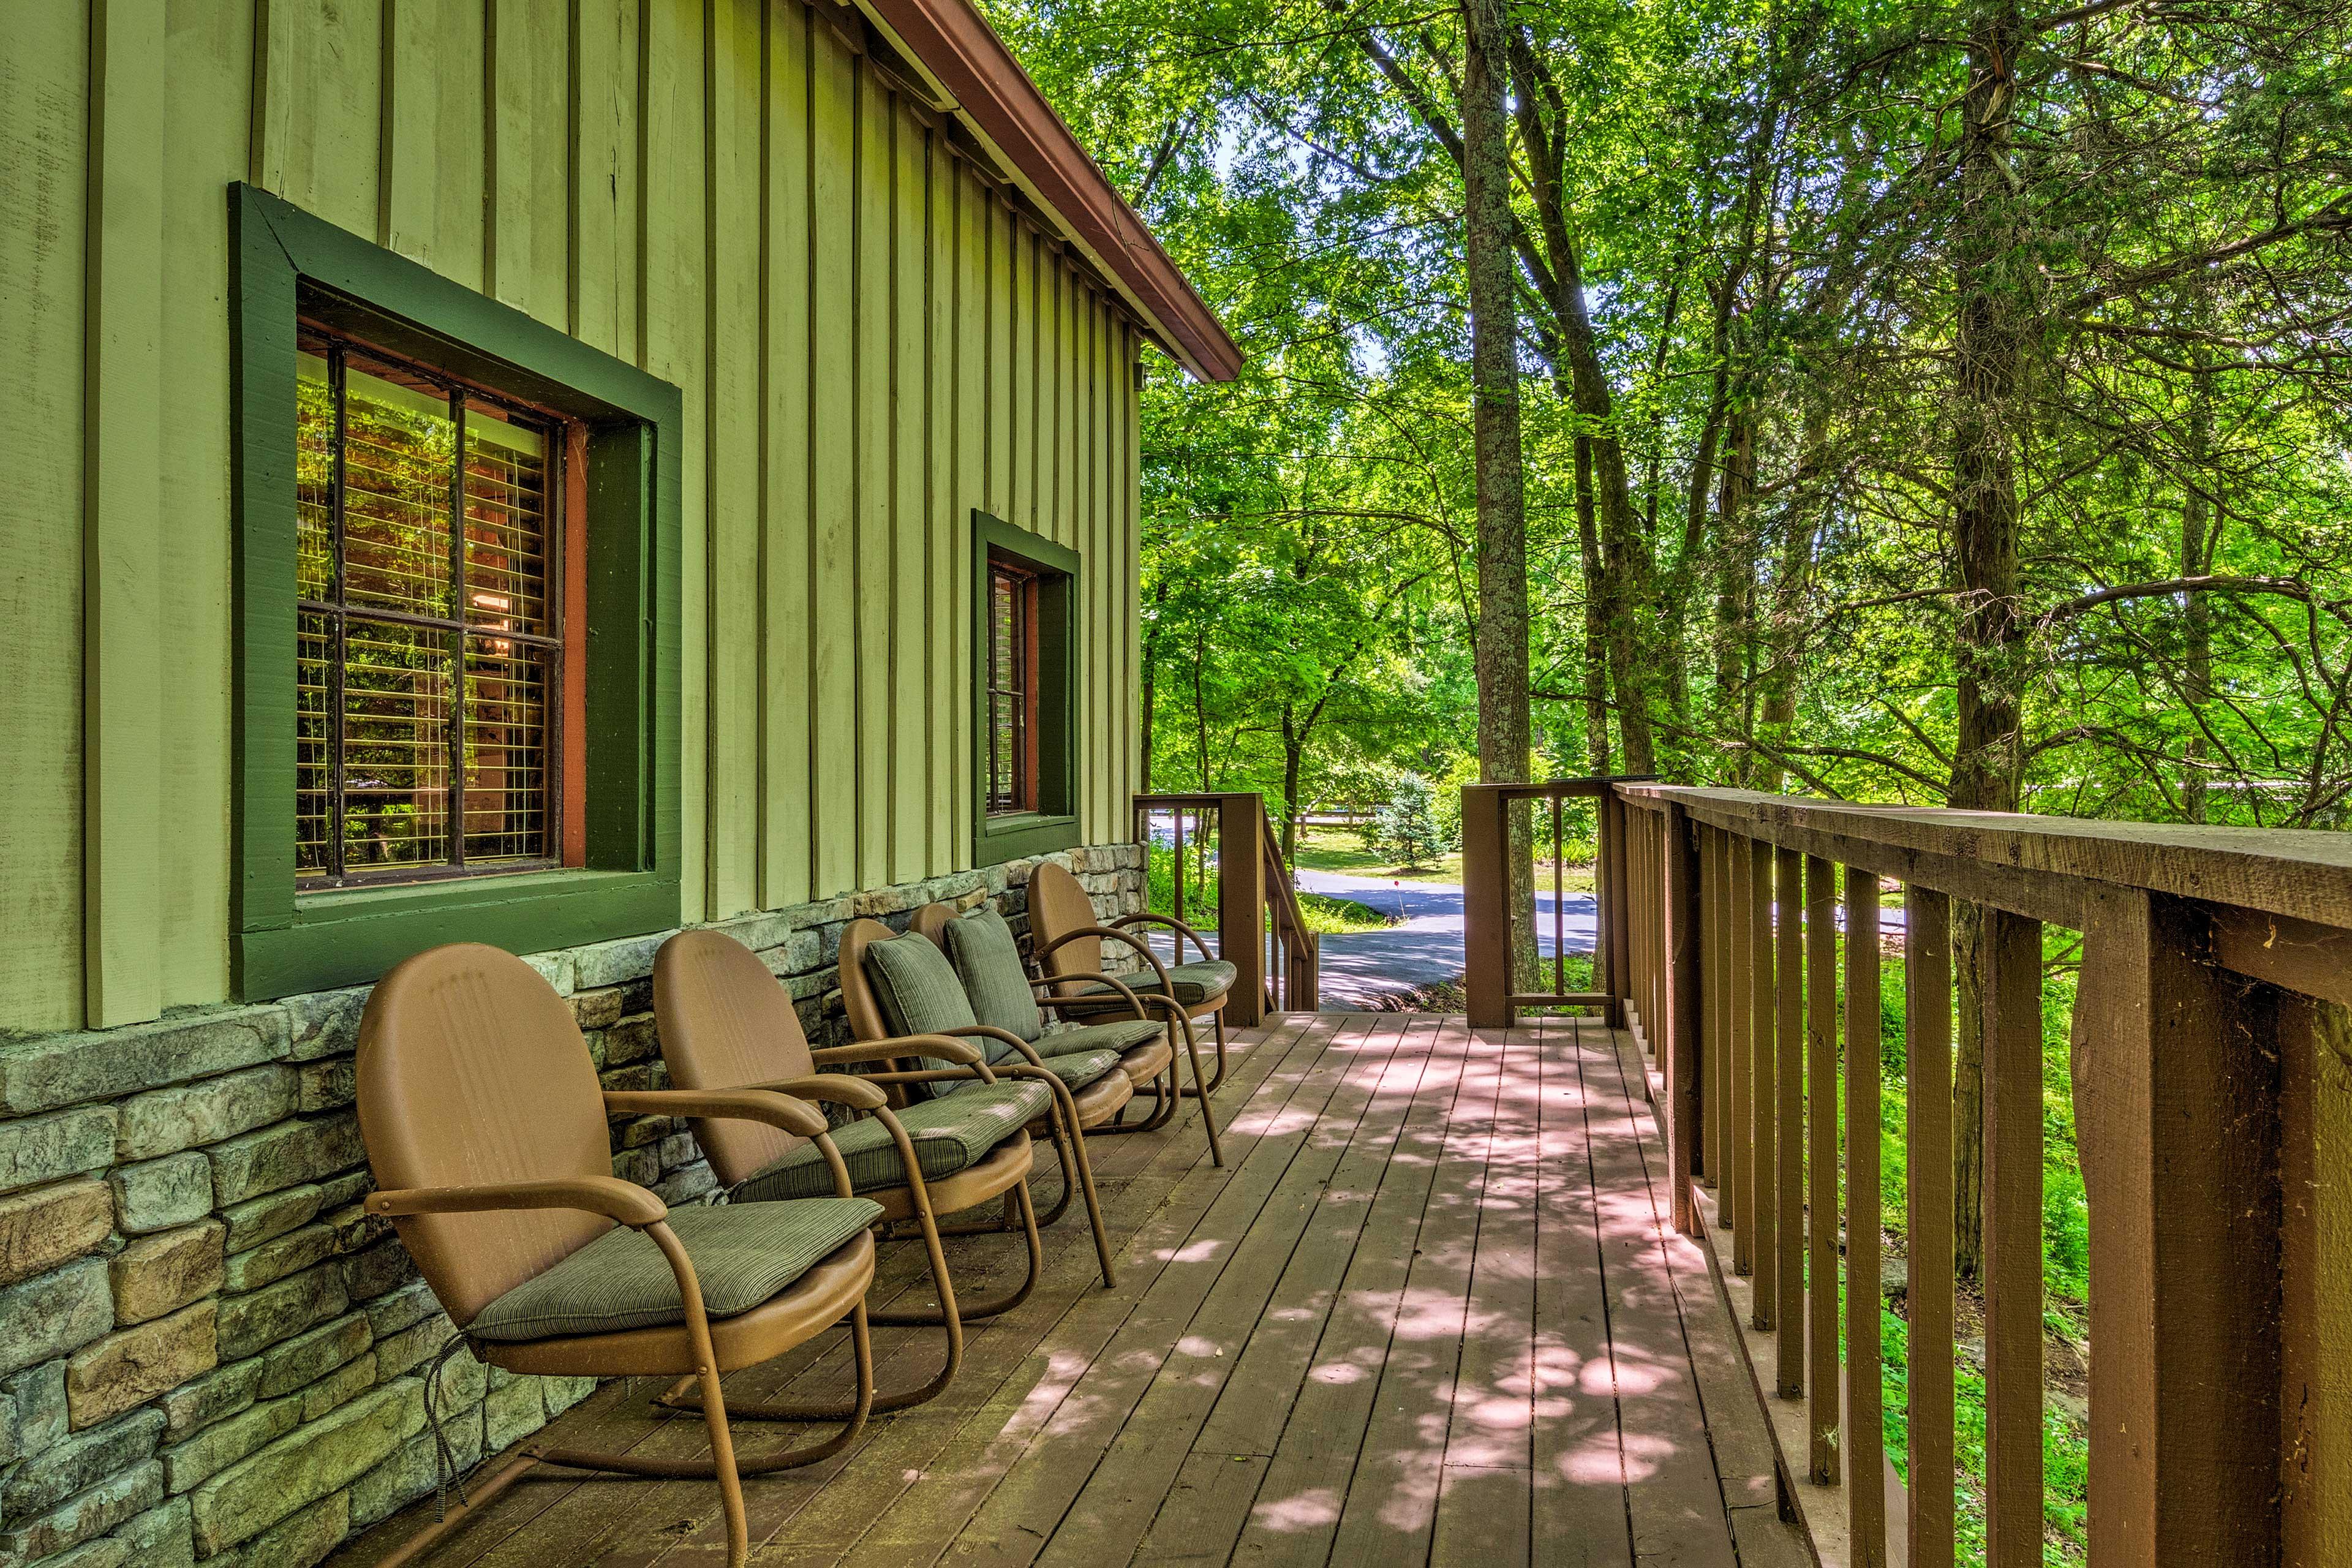 This 2-bedroom, 2-bath cabin also includes a wraparound deck.